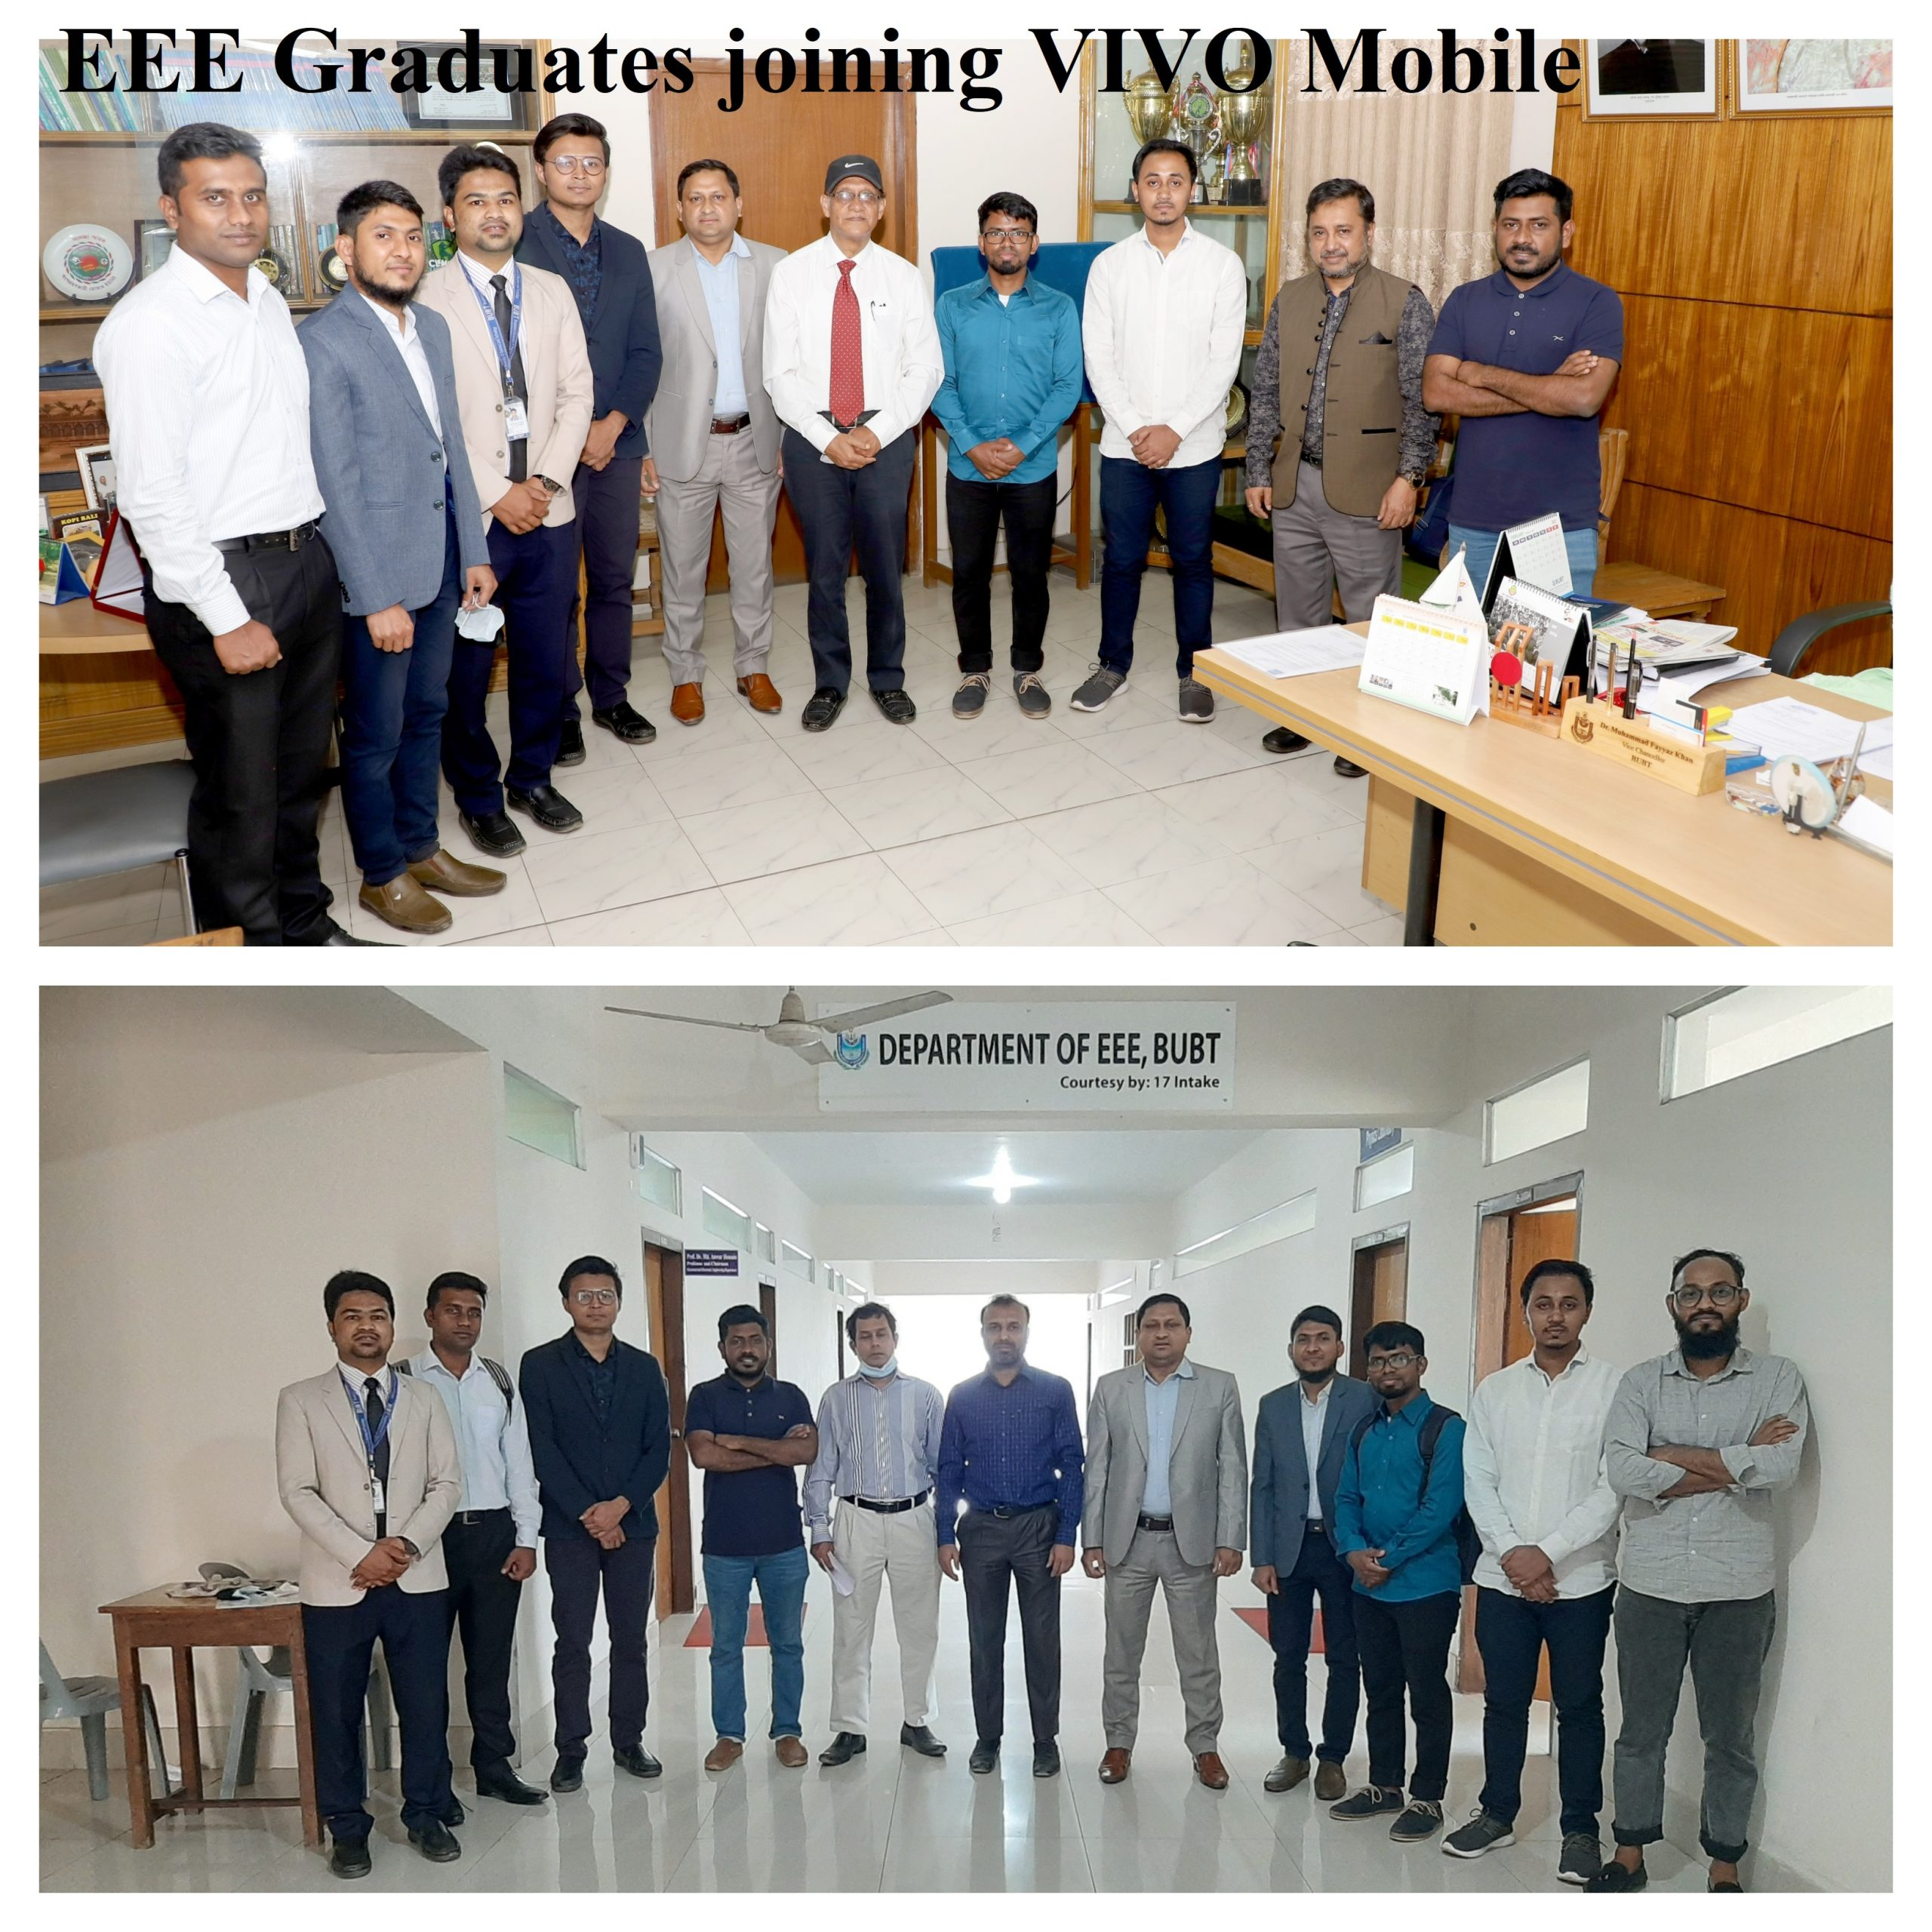 EEE Graduates joining VIVO Mobile